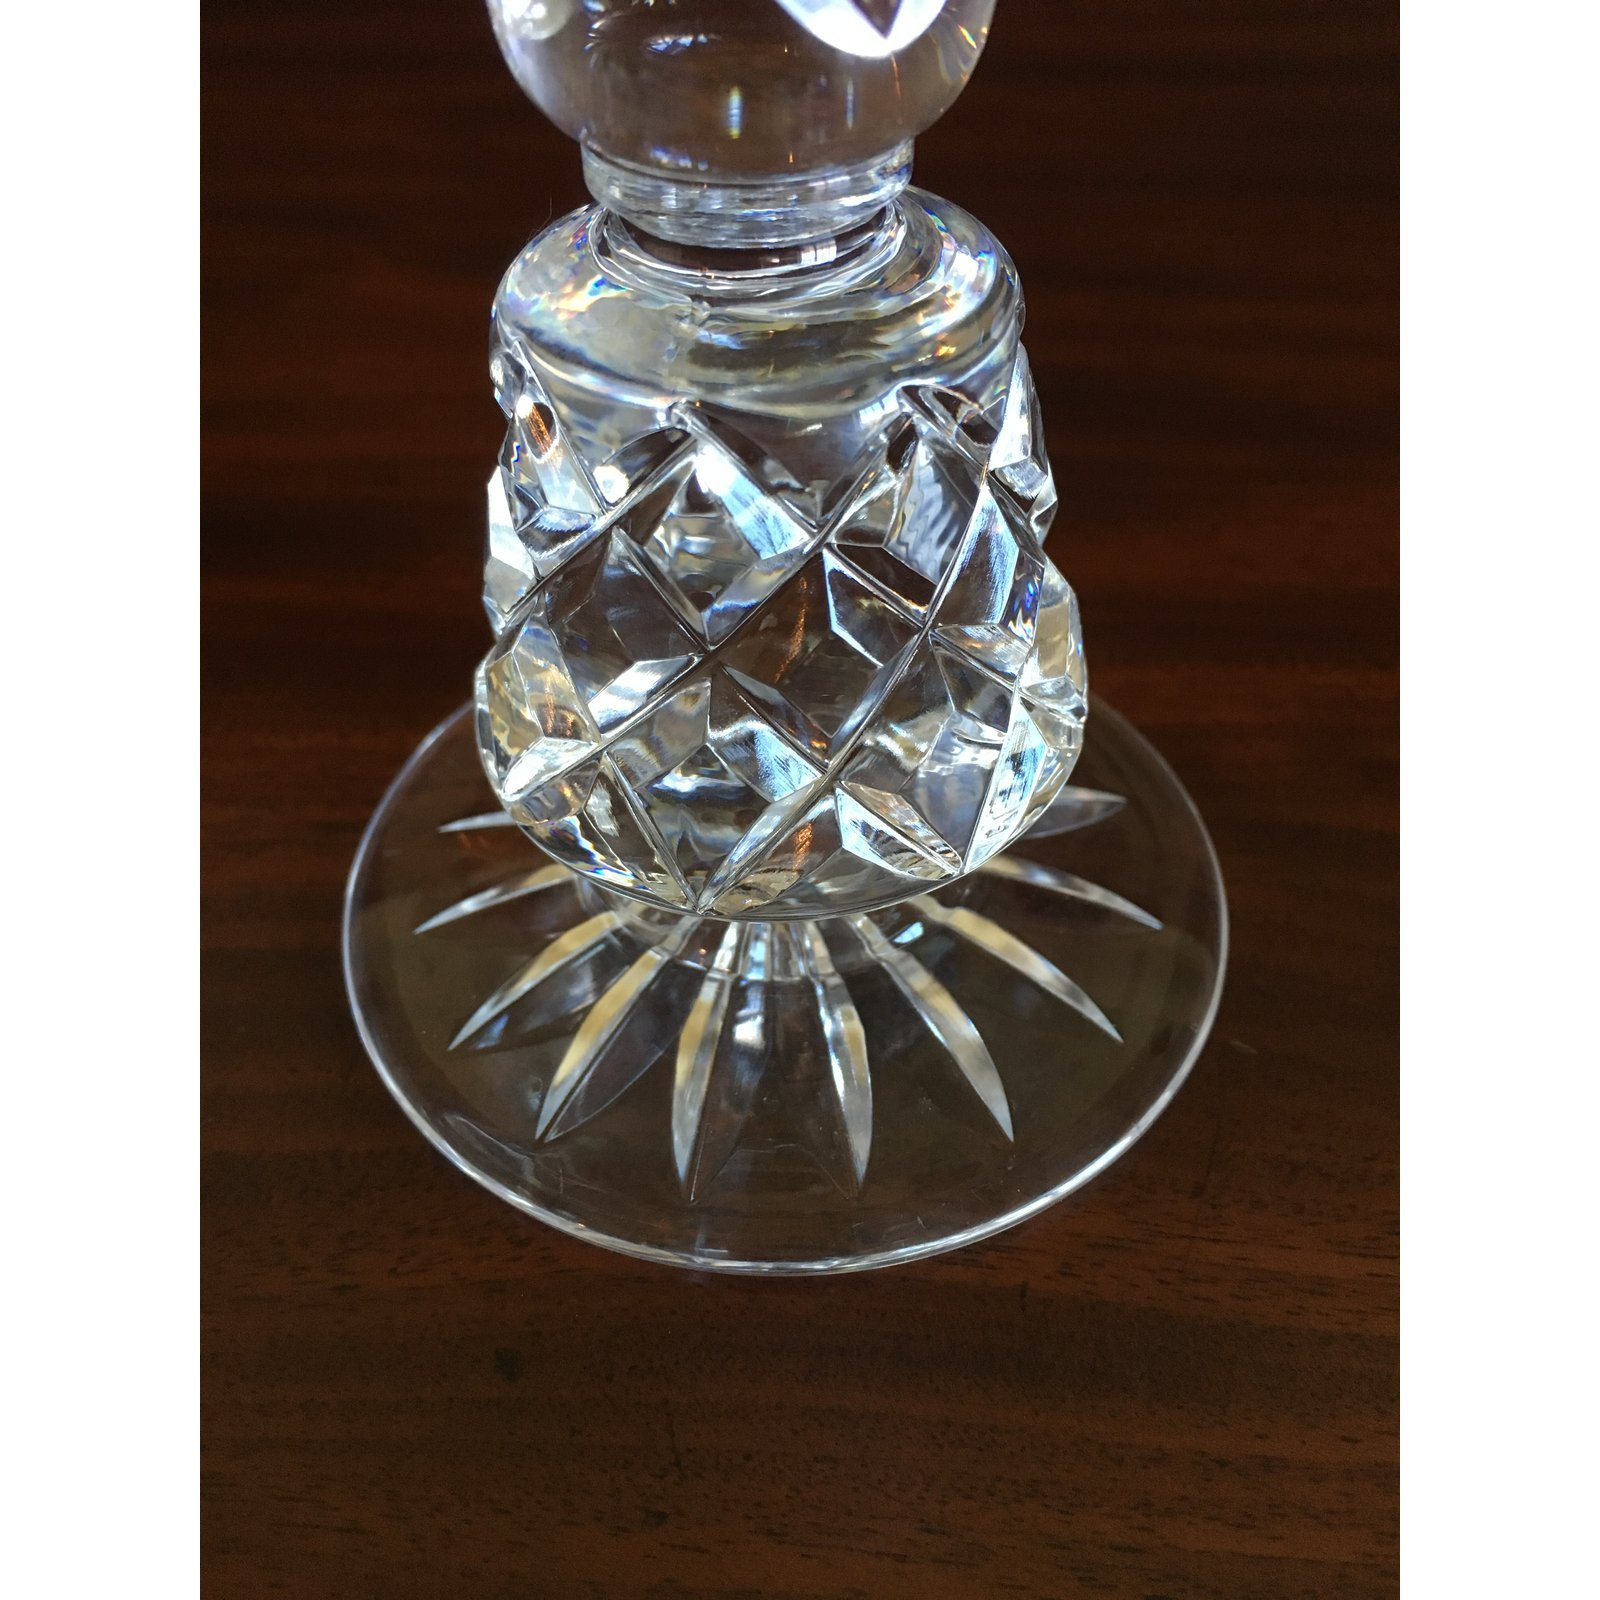 Vintage Crystal Candle Holders Lenox Charleston Pattern - a Pair